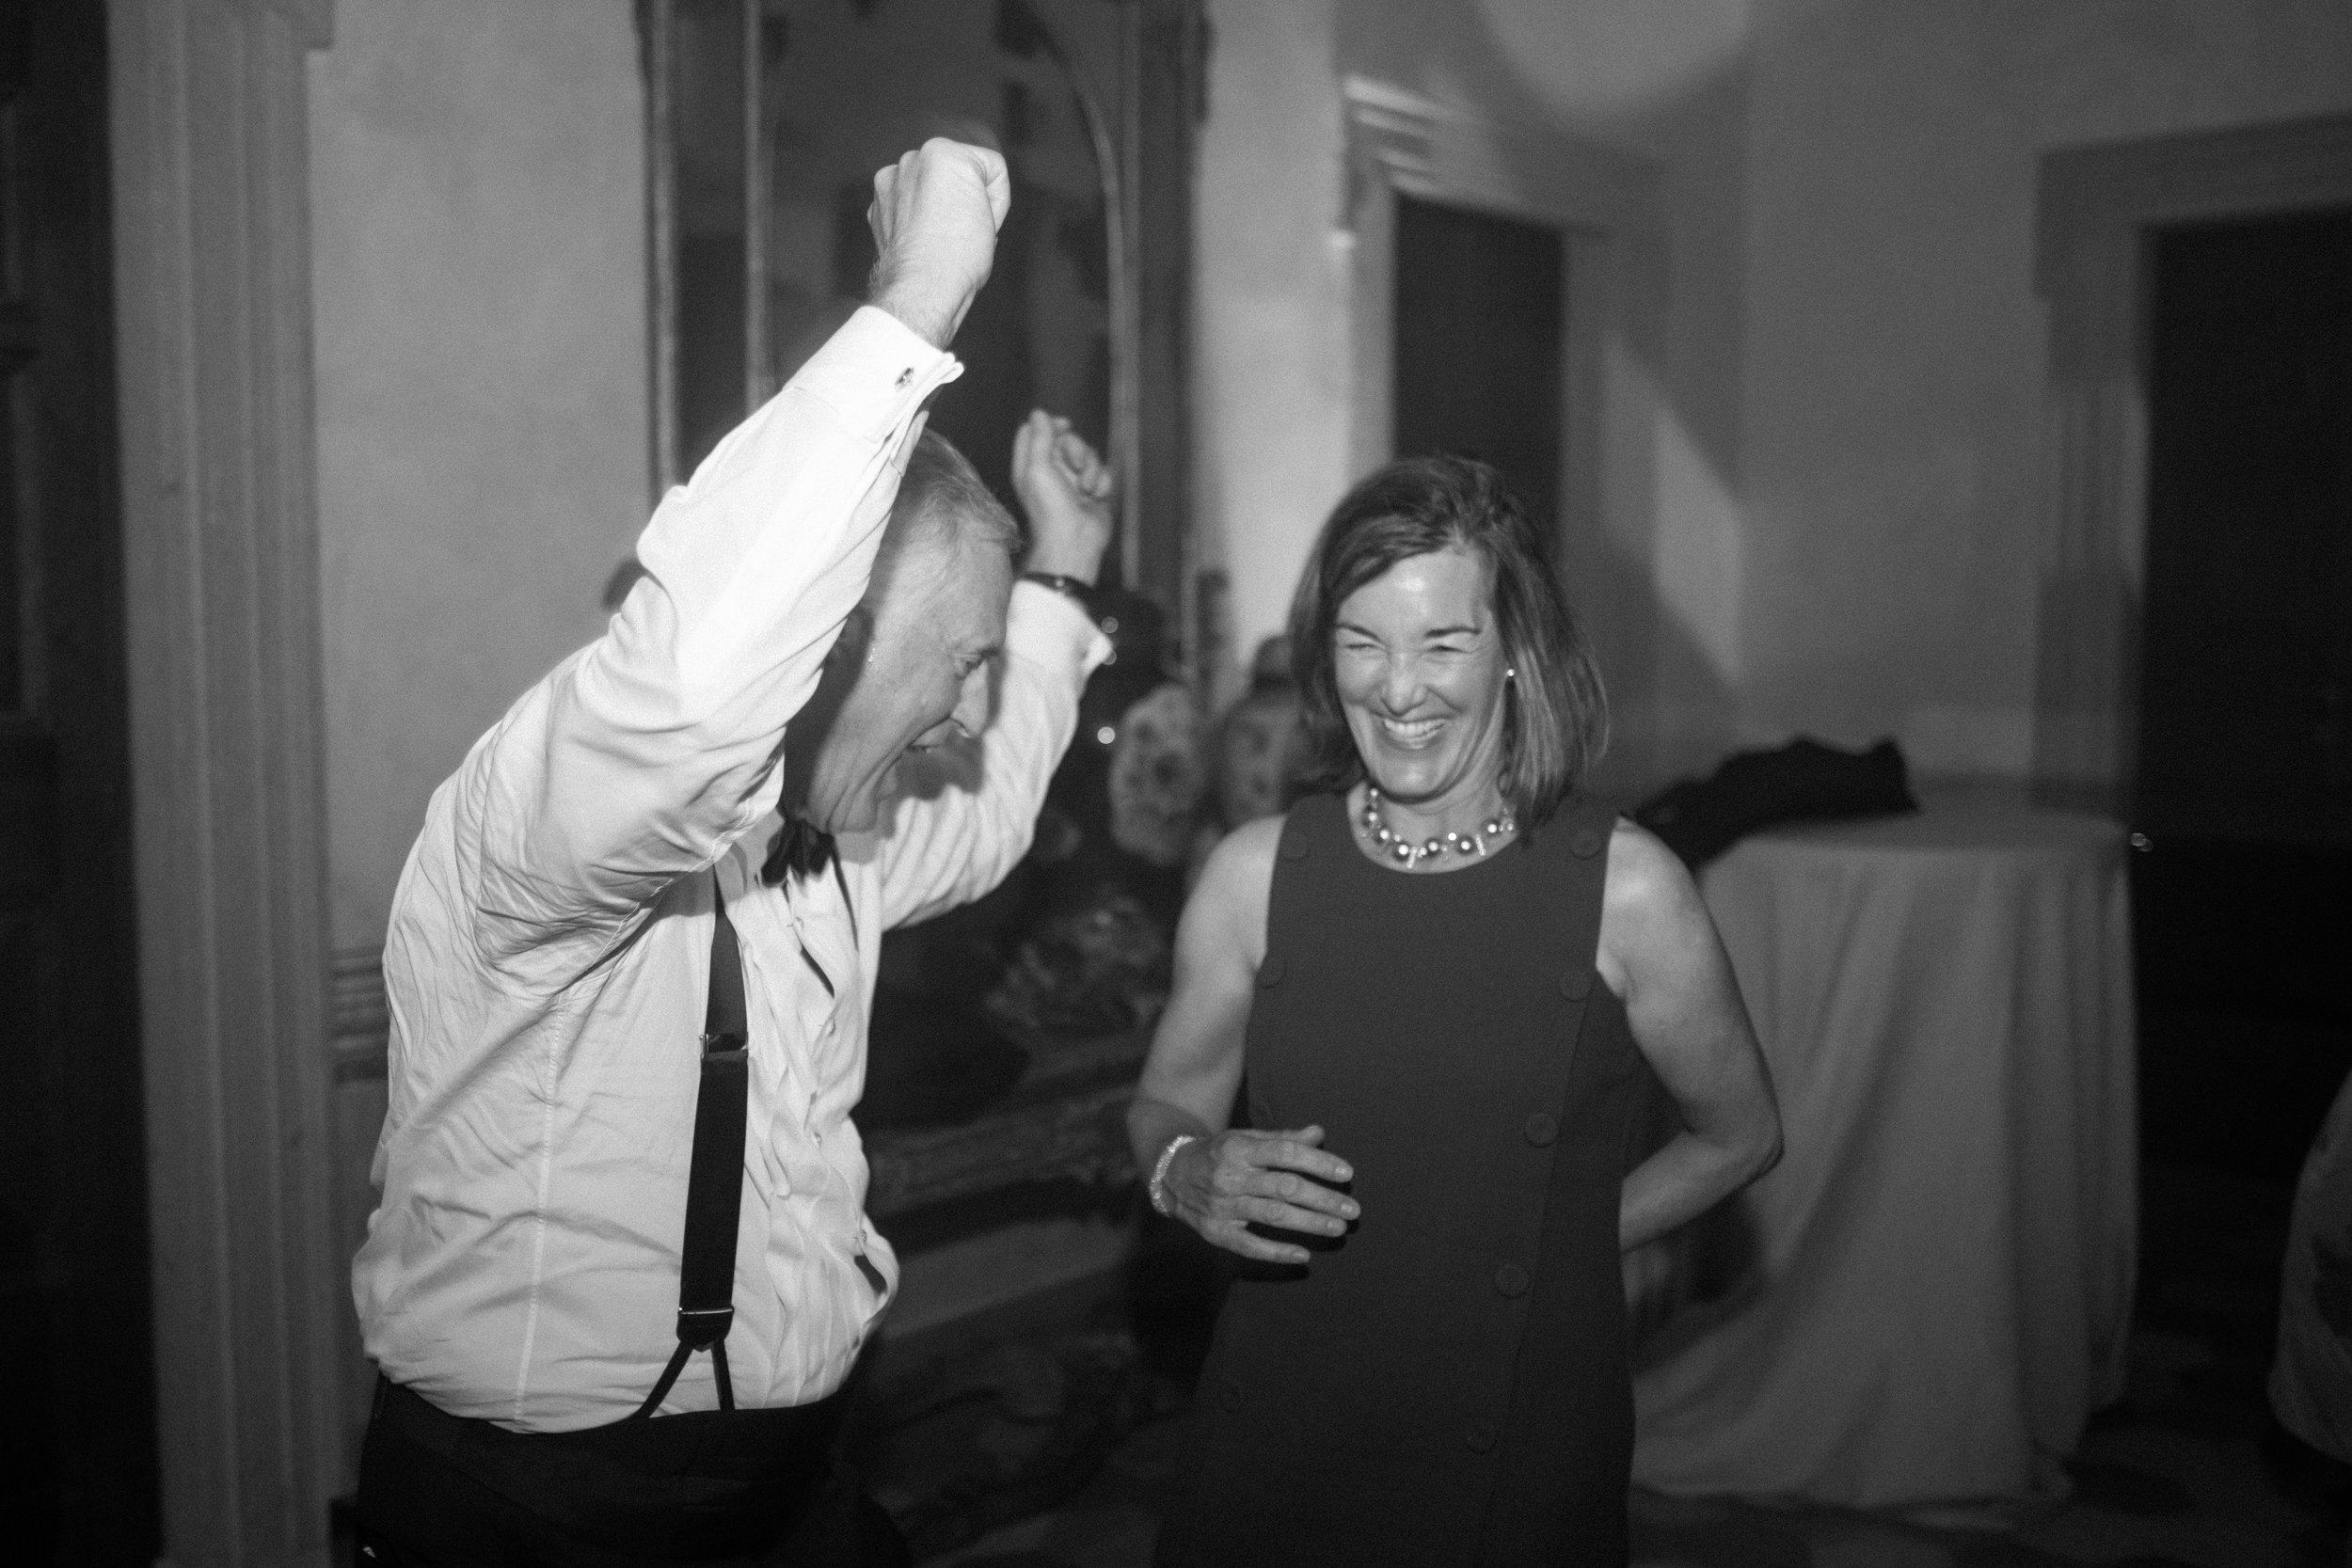 14_late night dancing-1498.jpg